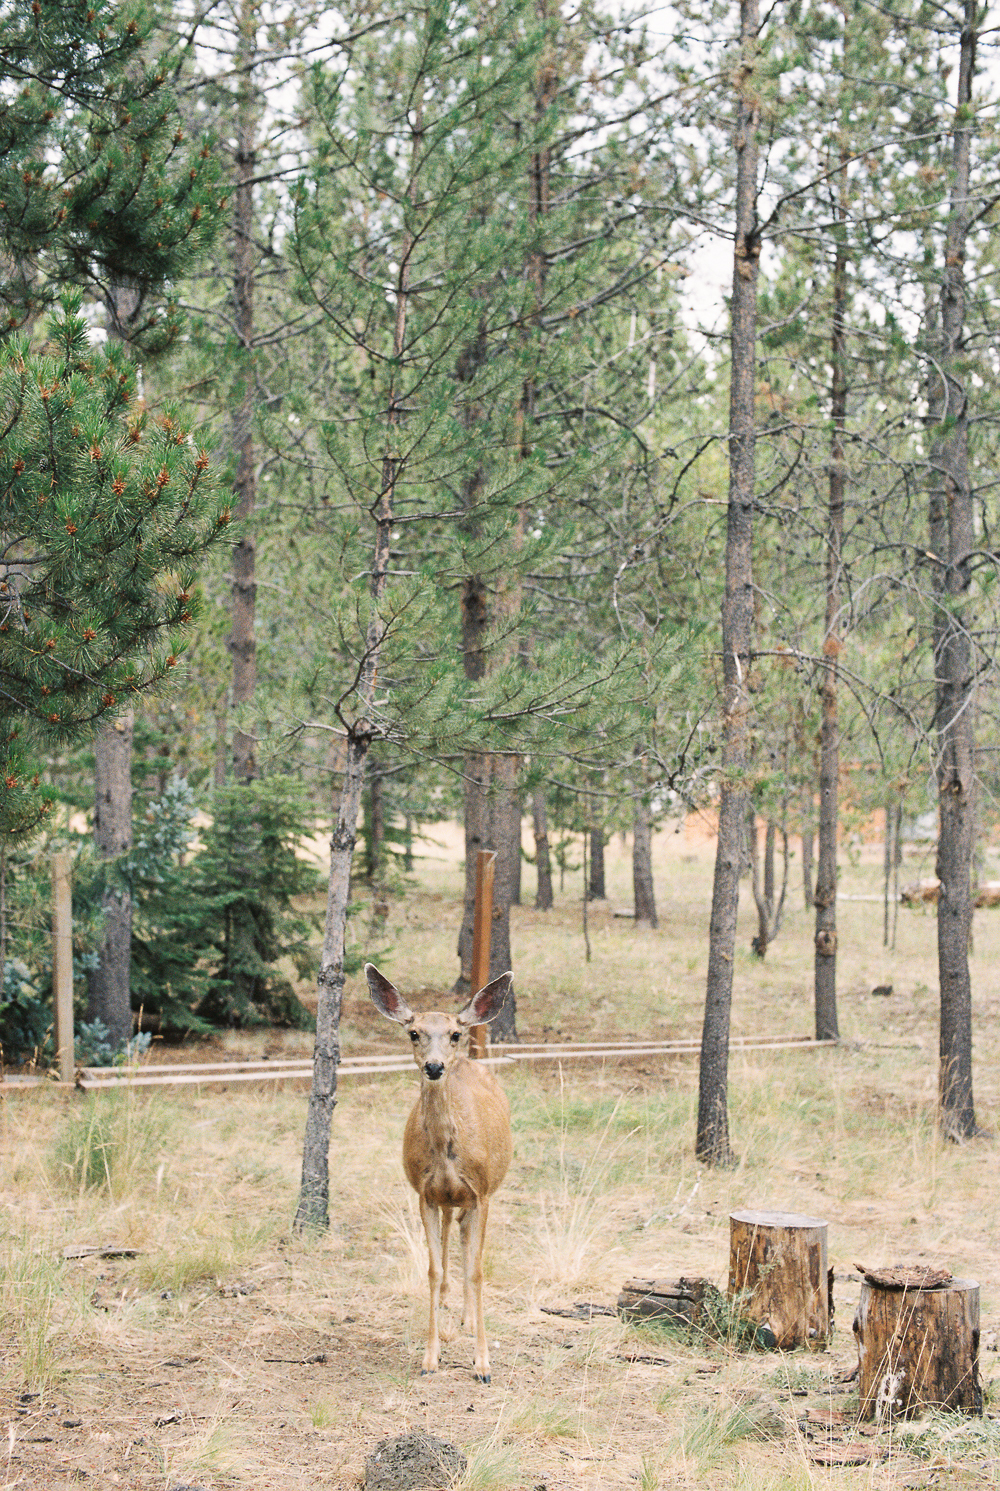 Mama Deer, Sunriver, Oregon - Portra 400 on Nikon N90s